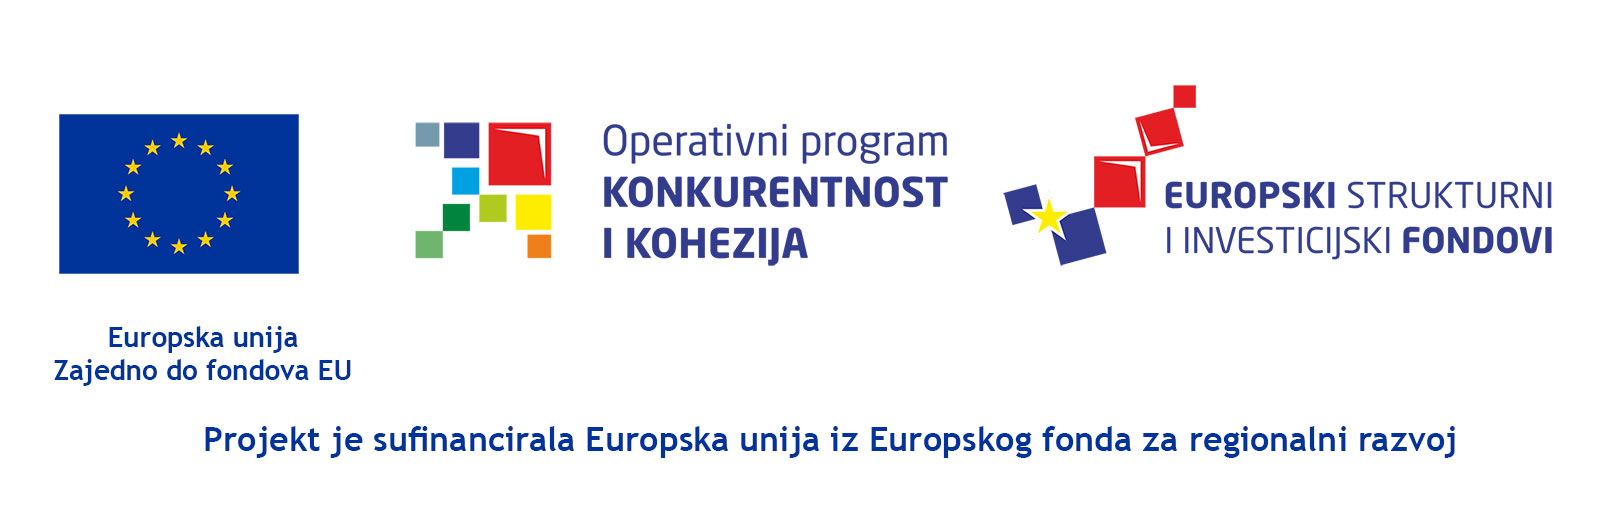 https://www.omolab.com/wp-content/uploads/2020/05/eu_vidljivost_4.jpg